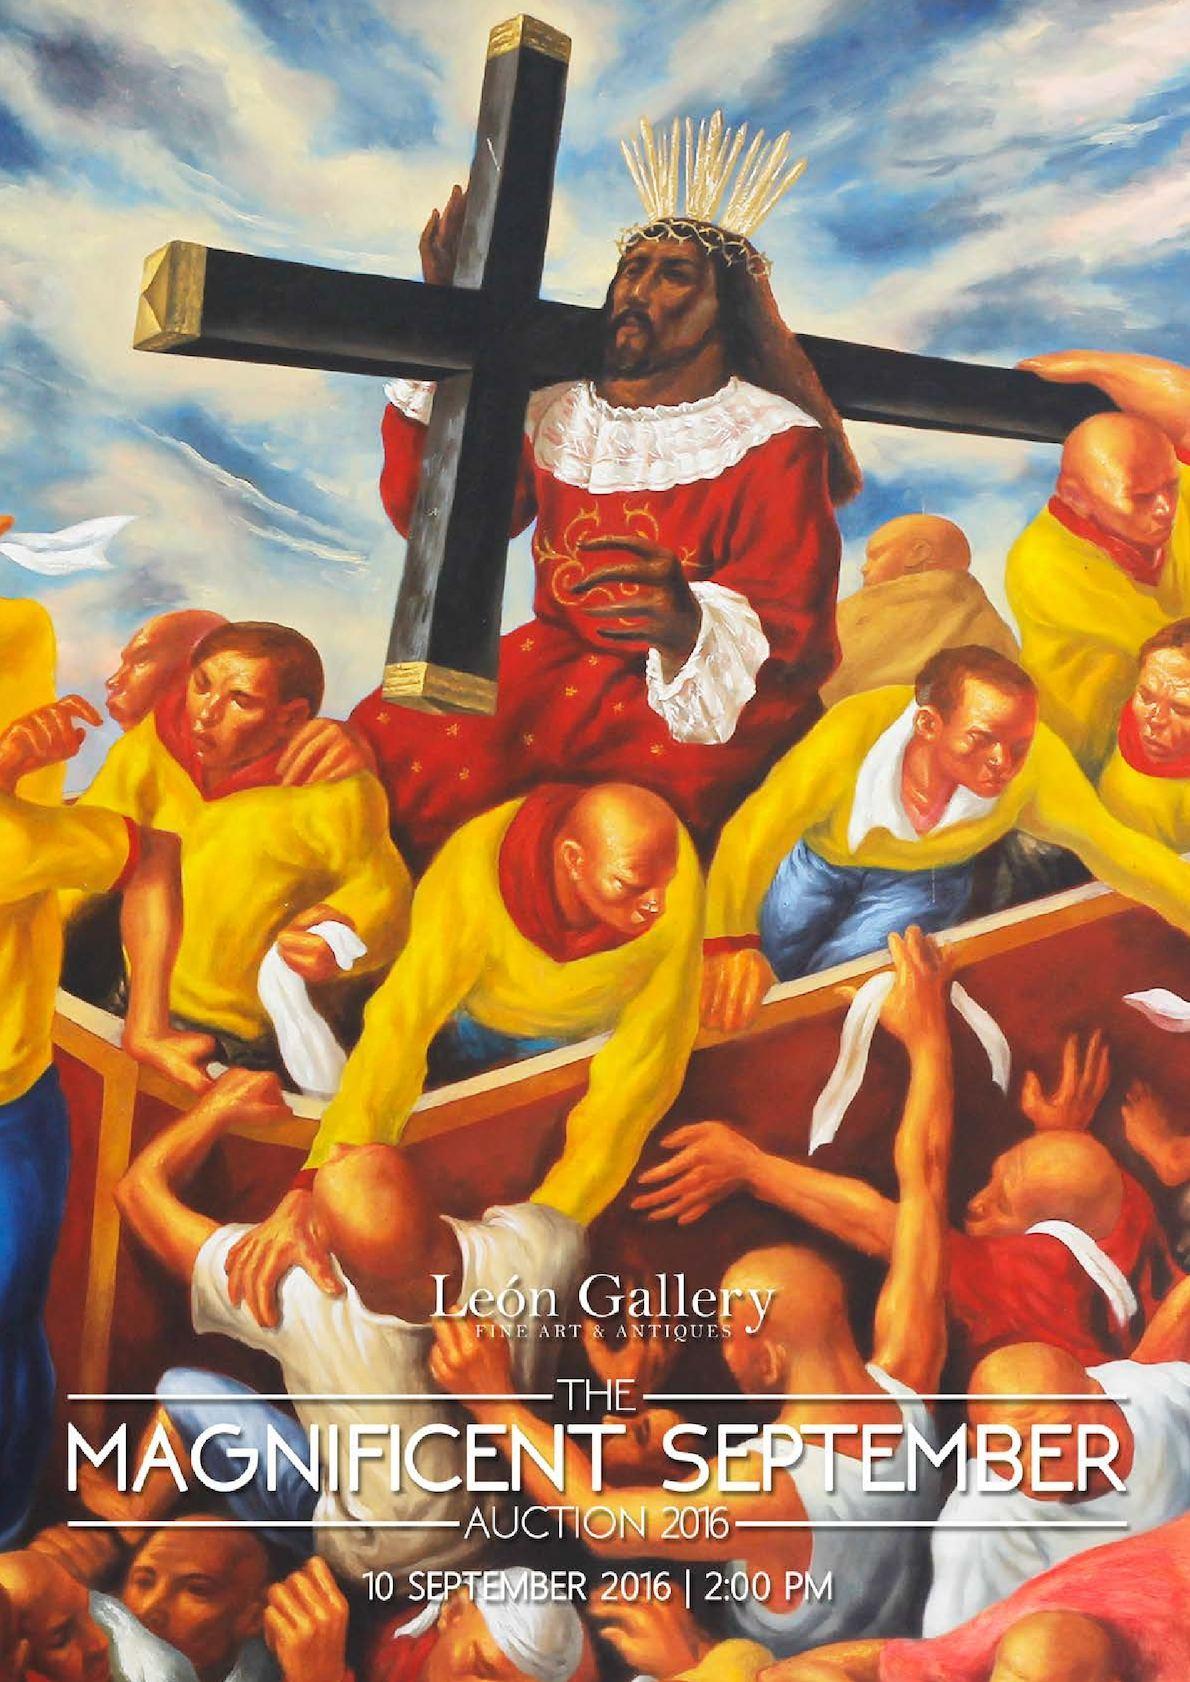 Calaméo - The Magnificent September Auction 2016